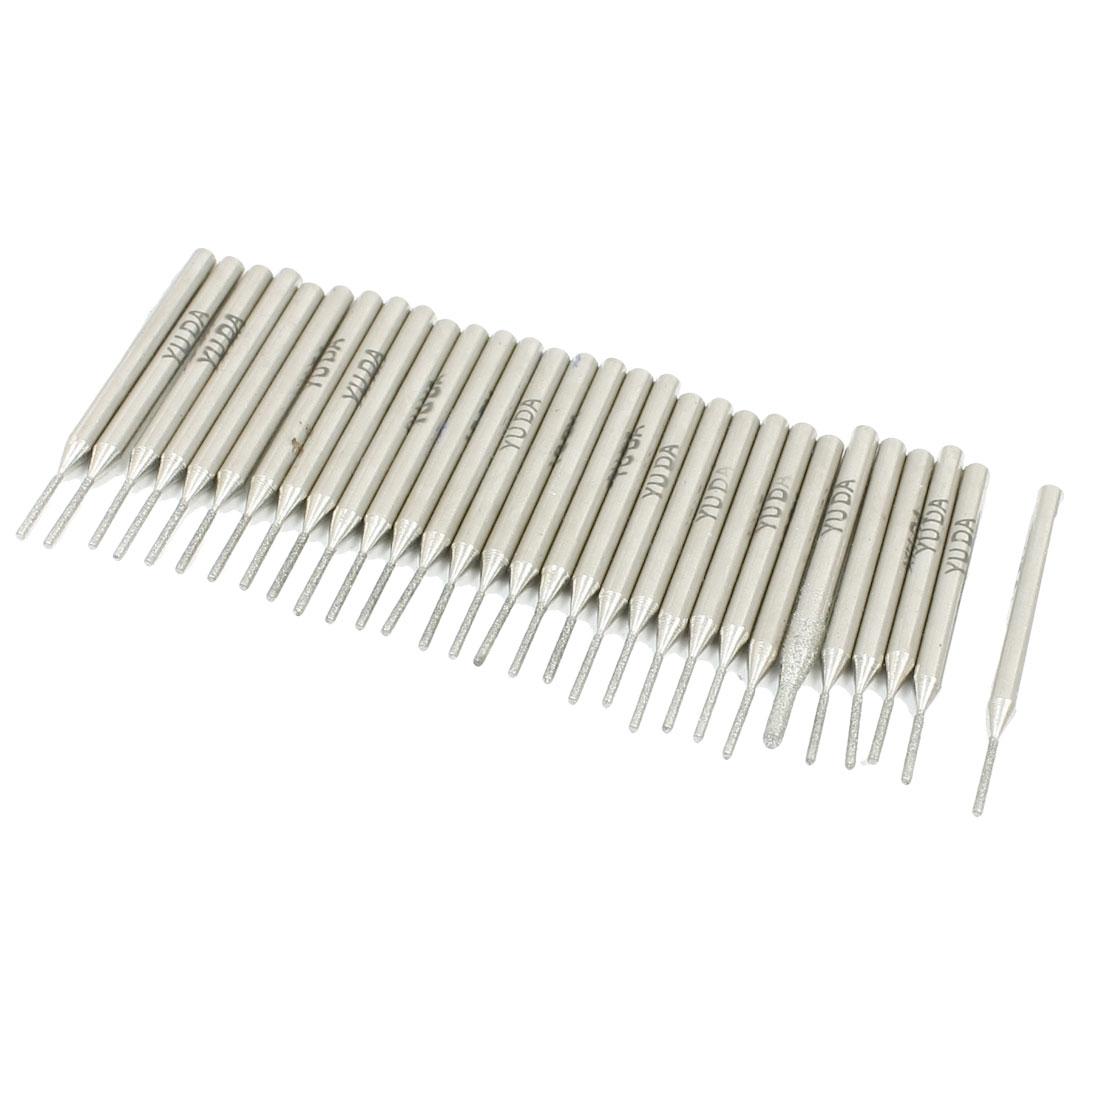 30Pcs 1mm Cylinder Tip 3mm Shank Diamond Point Grinding Bits